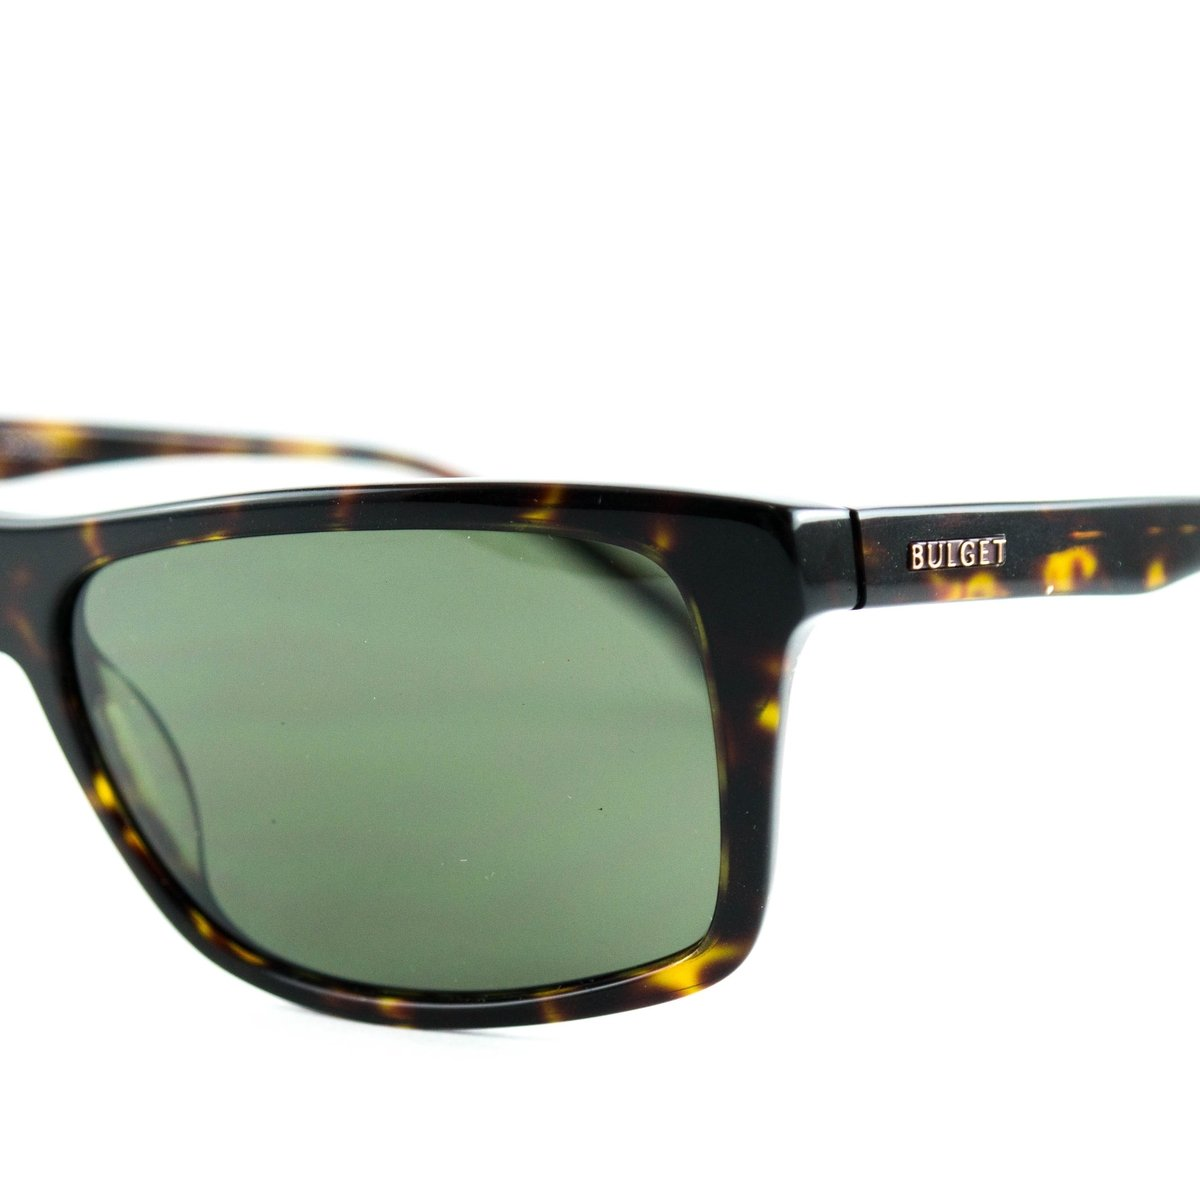 ad60a93598af3 Óculos de Sol Bulget - Marrom - Compre Agora   Netshoes